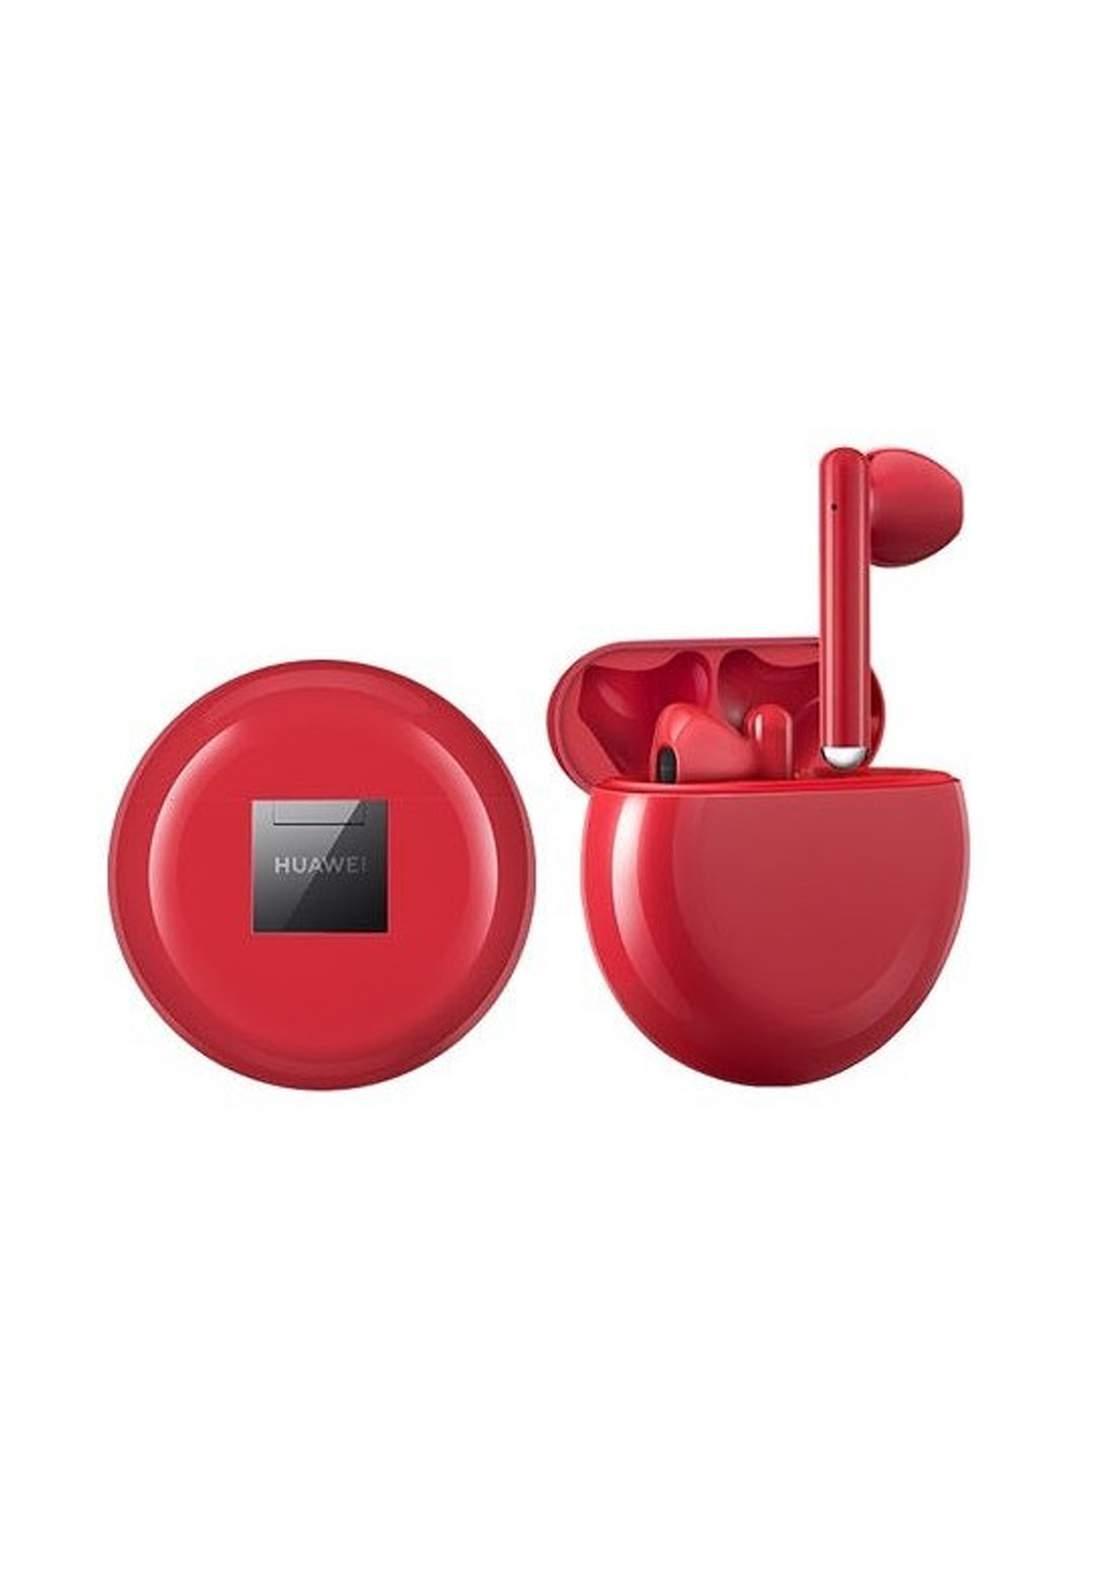 Huawei Freebuds 3 Bluetooth Earbuds Red سماعات بلوتوث